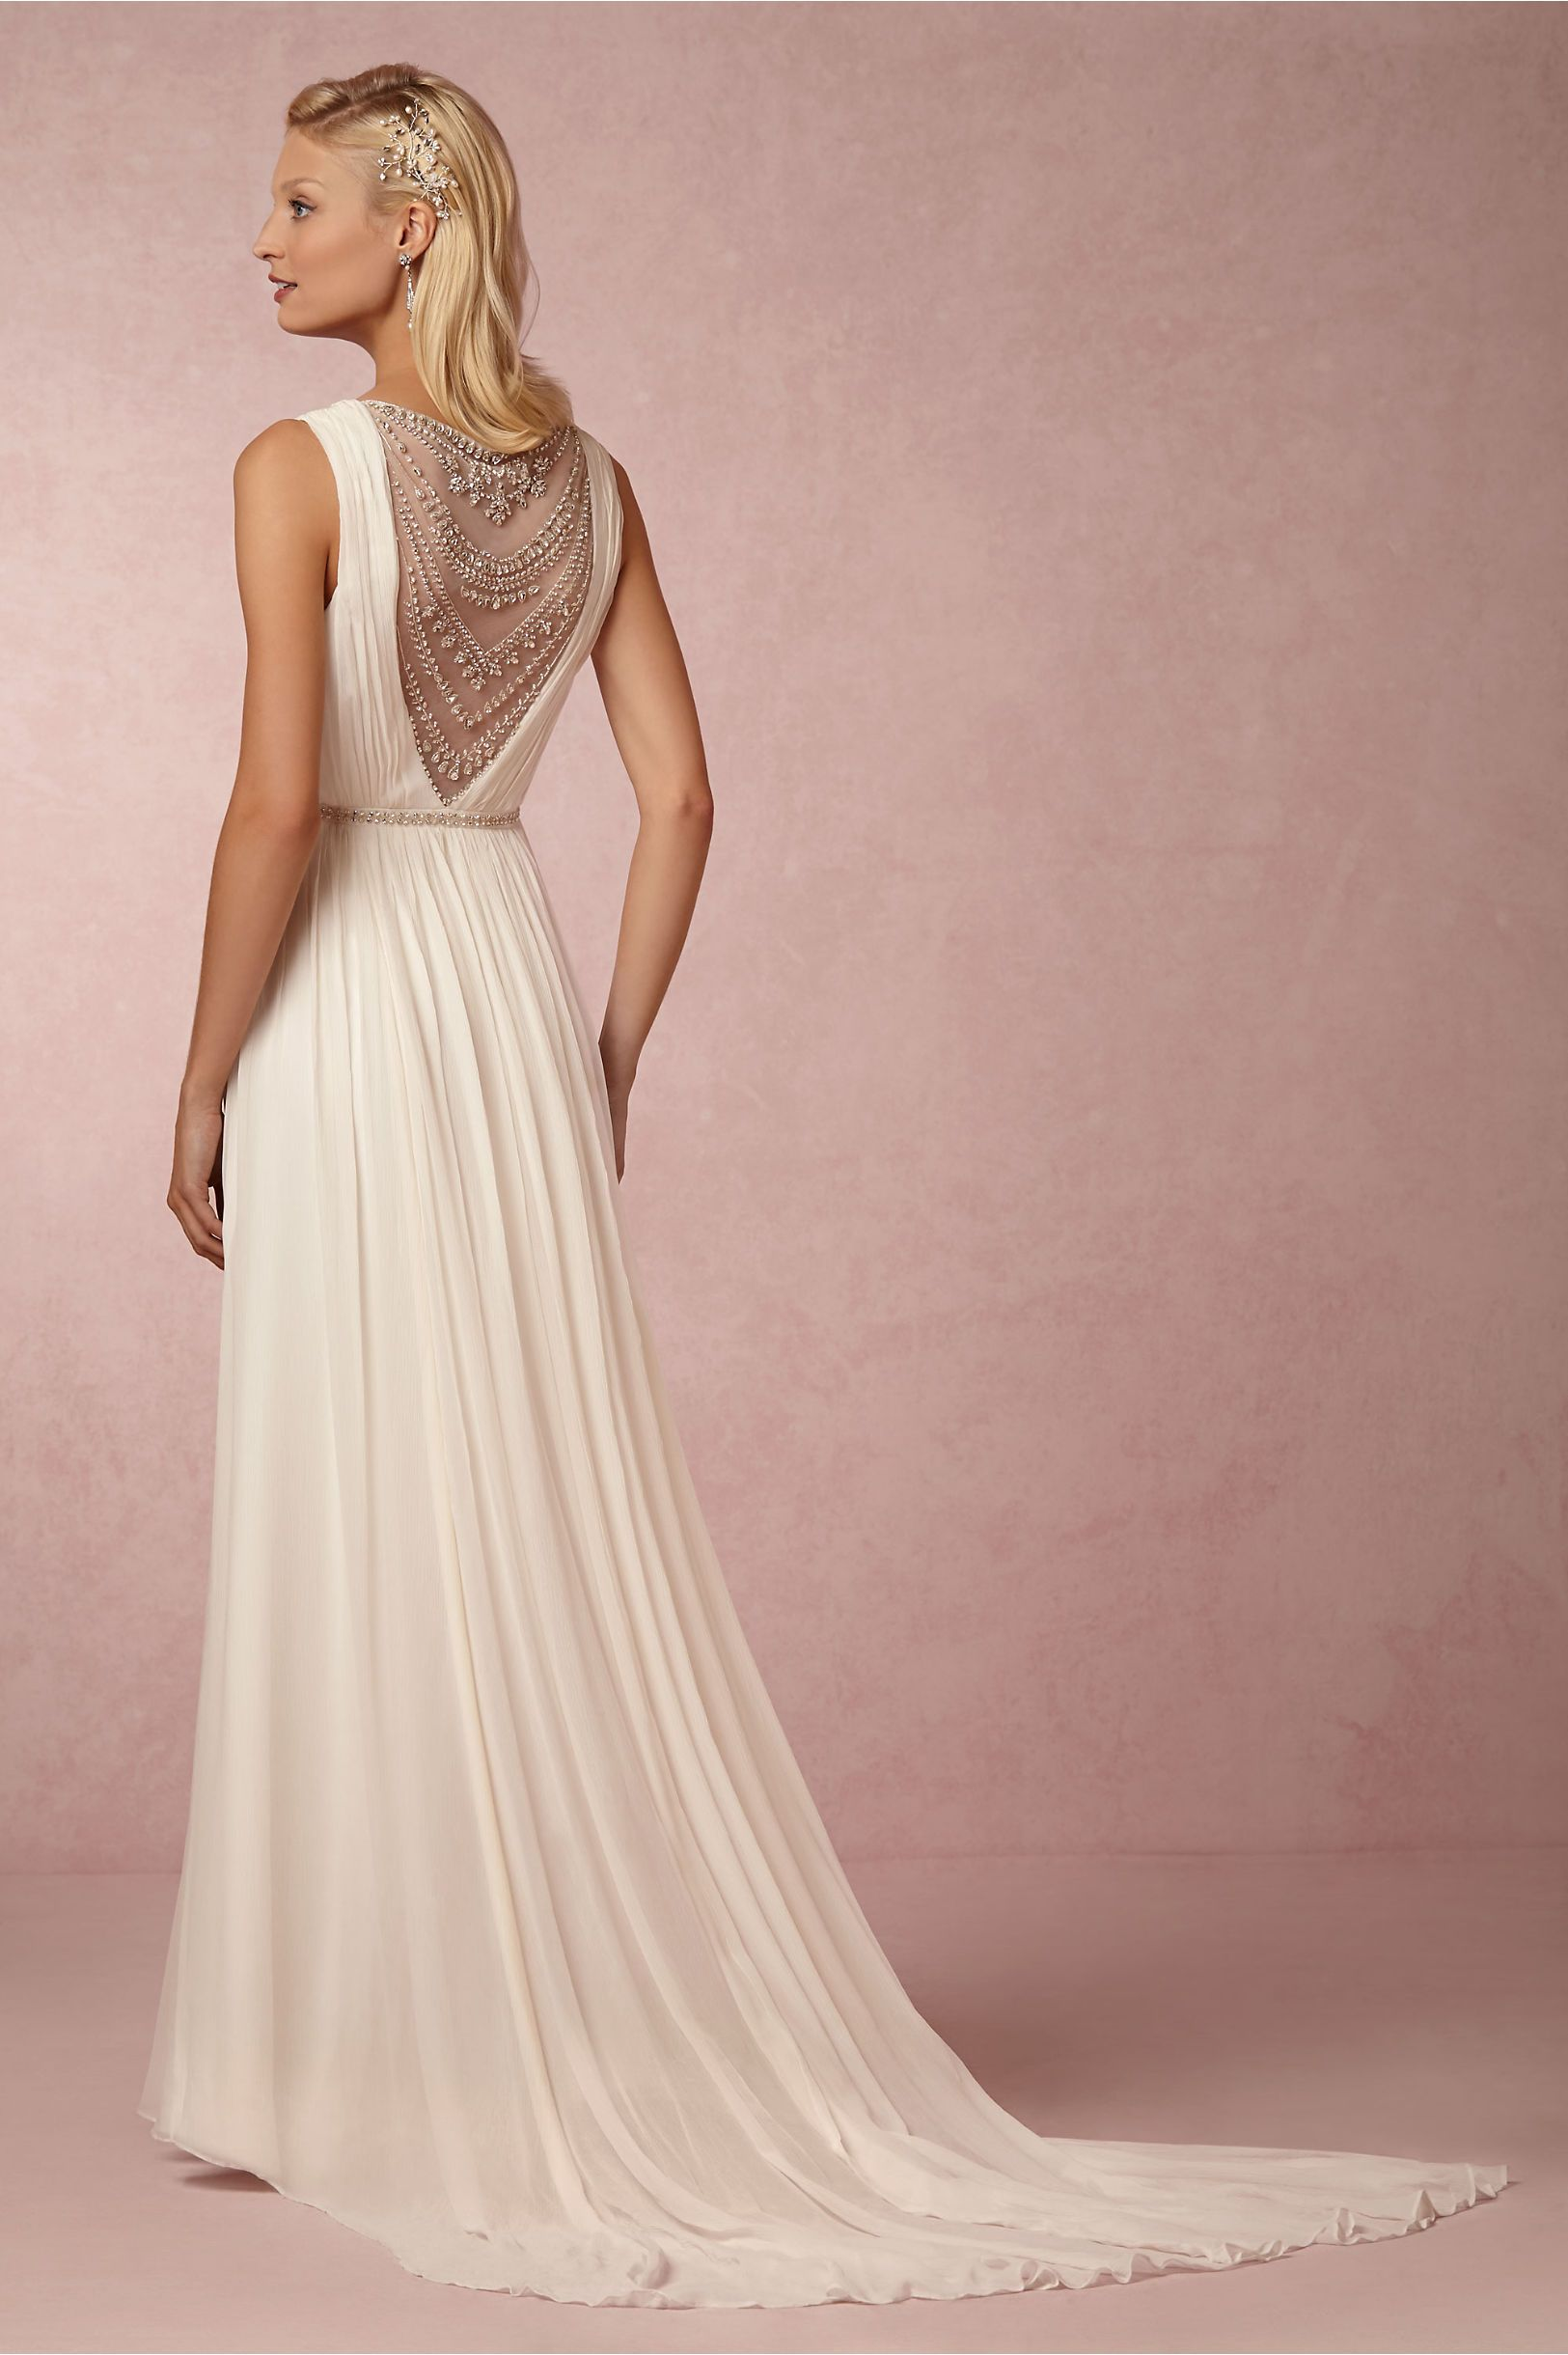 BHLDN\'s Nicole Miller Millie Gown in Ivory | Boda, Vestidos y Boda ...